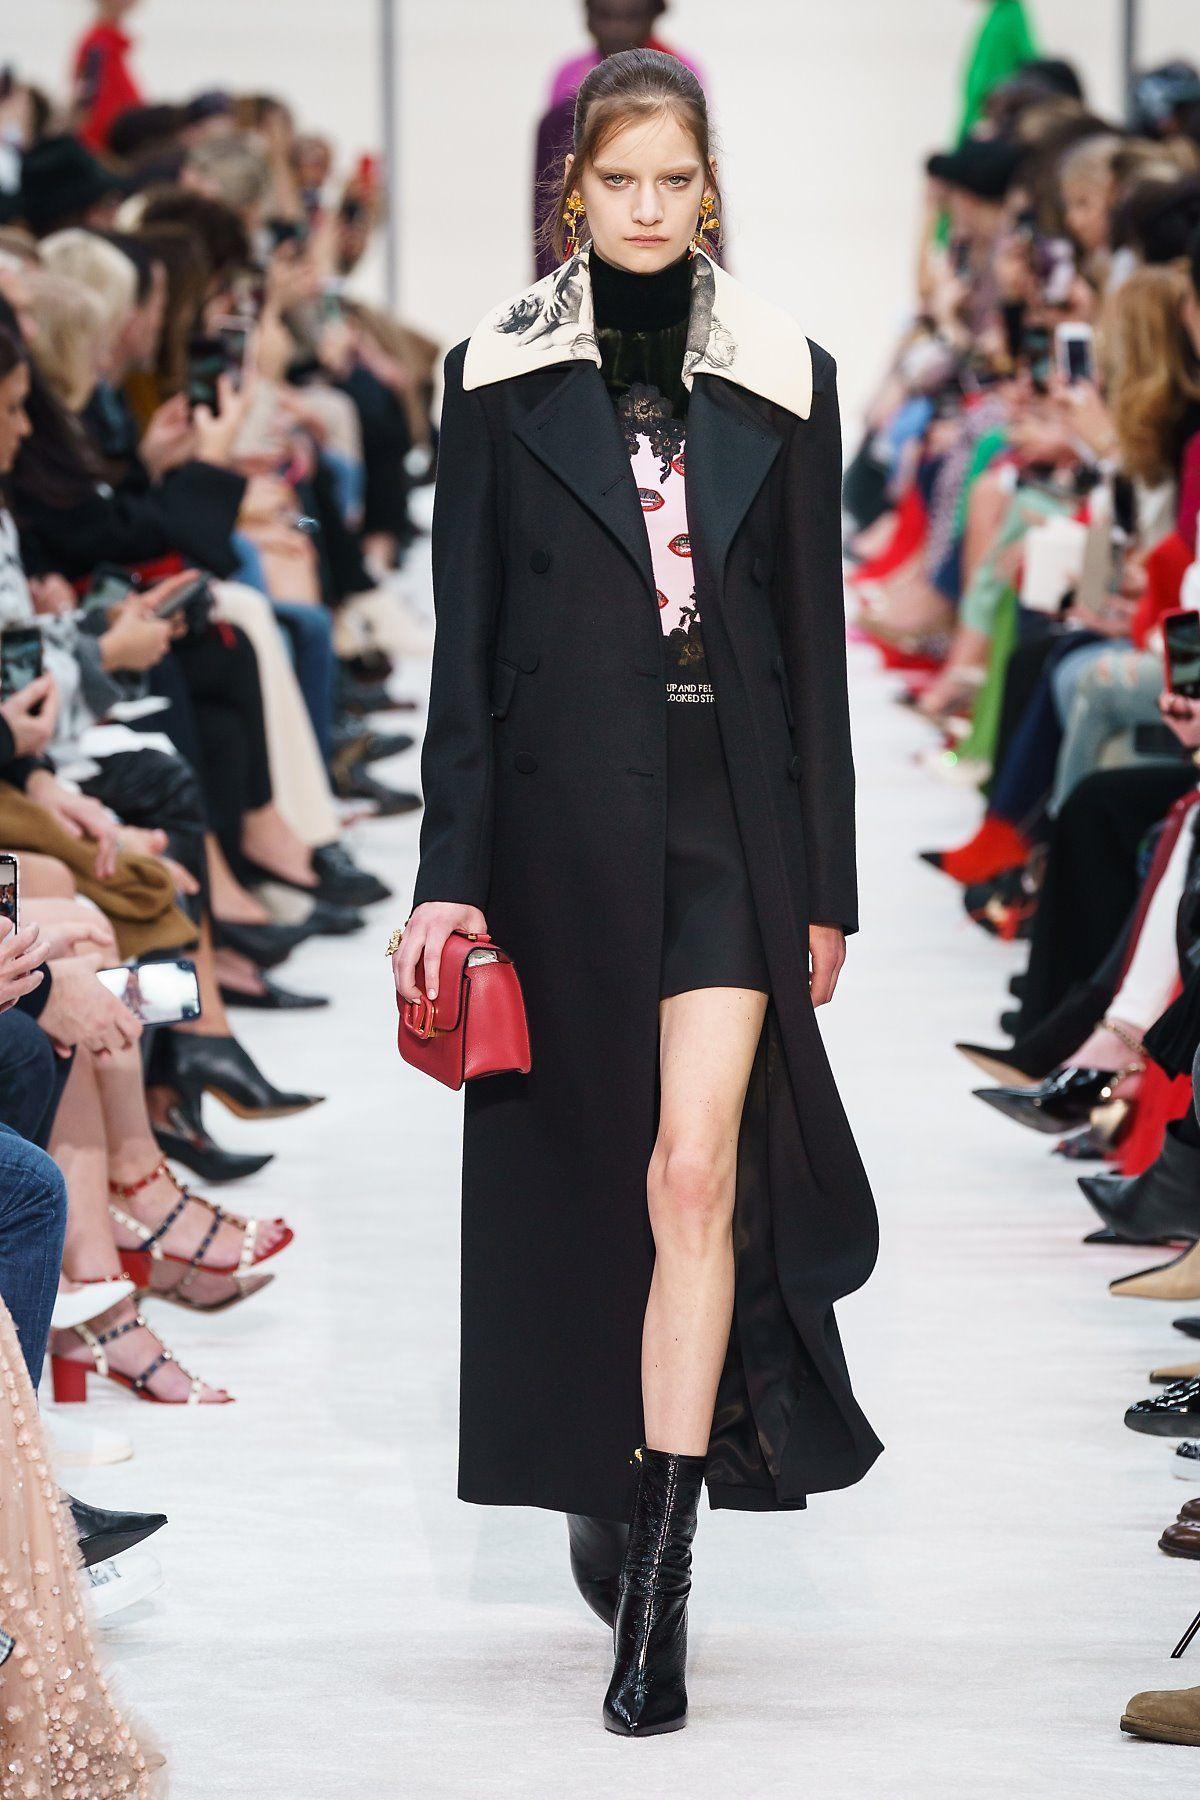 19FW 발렌티노(Valentino) 컬렉션 네이버 포스트 패션 스타일, 패션 트렌드, 레디 투 웨어